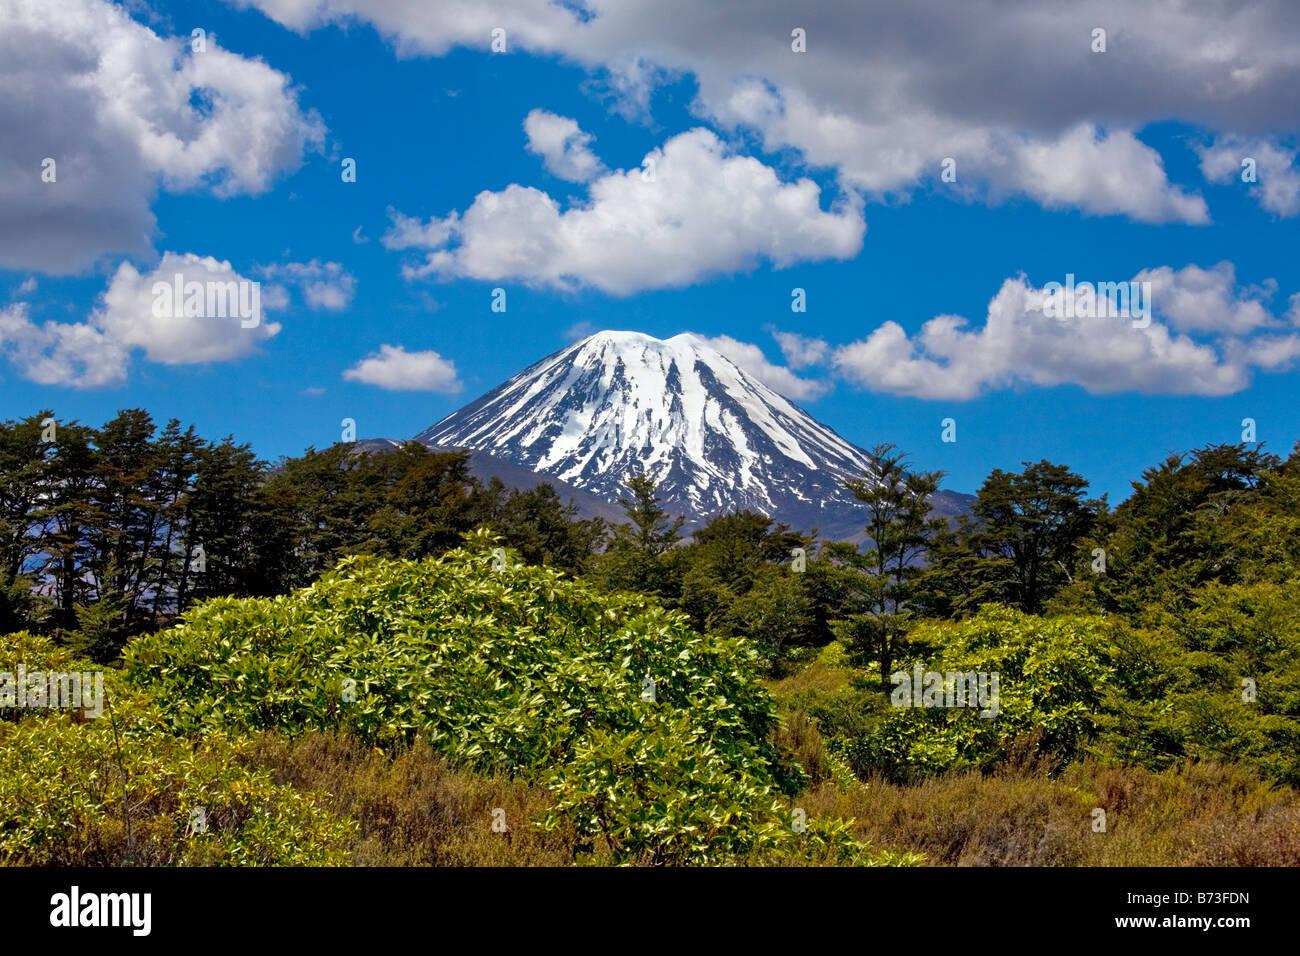 Mount Ngauruhoe.  New Zealand, North Island, Tongariro National Park, Central Plateau. - Stock Image